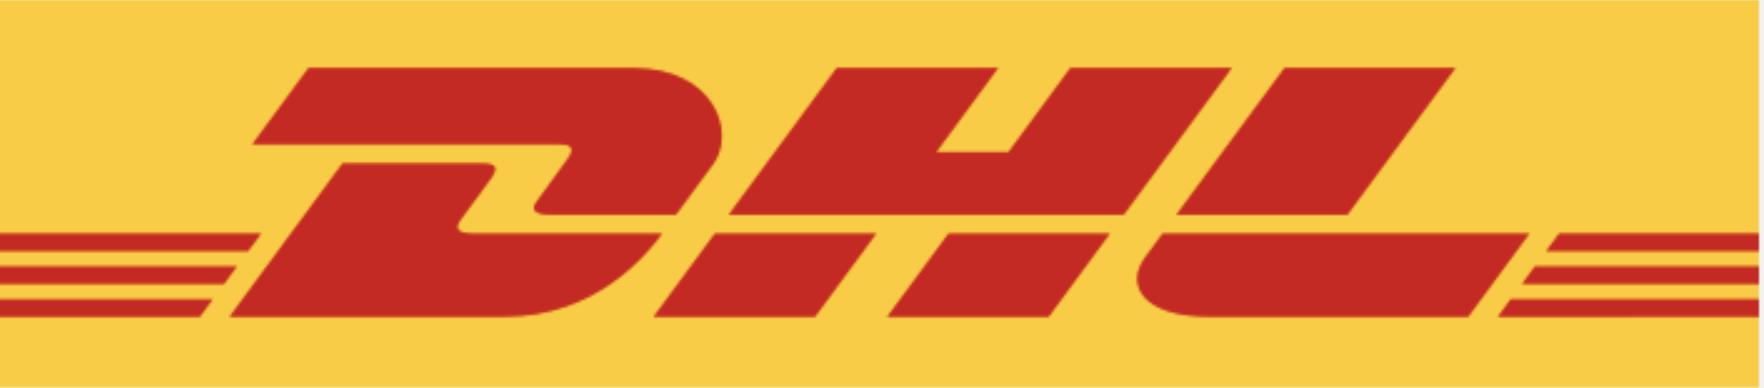 Standard Versand (DHL Paket)